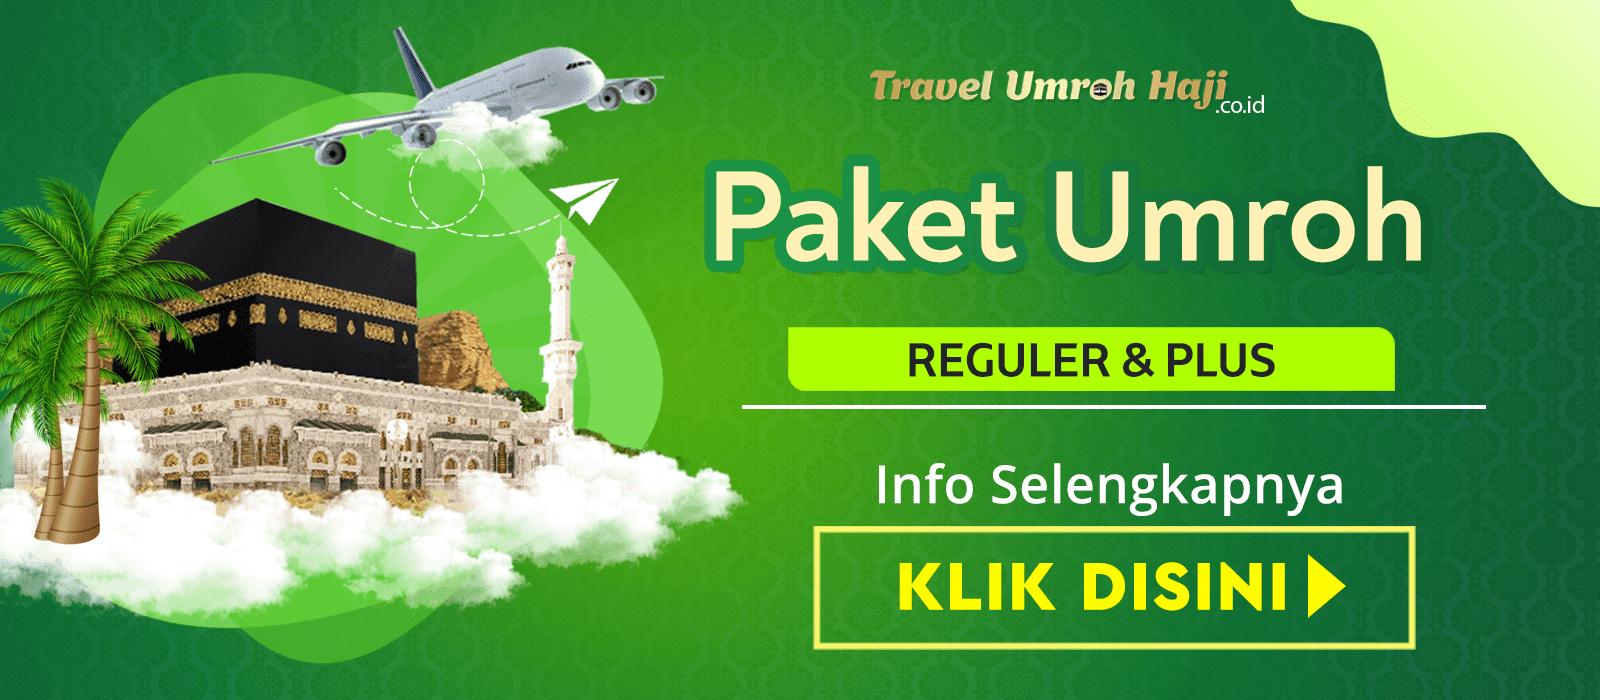 Paket Umroh Murah Reguler dan Plus : Turki, Dubai, Cairo, Aqso, Uzbekistan, Jadwal Umroh Permata Azzumar Wisata